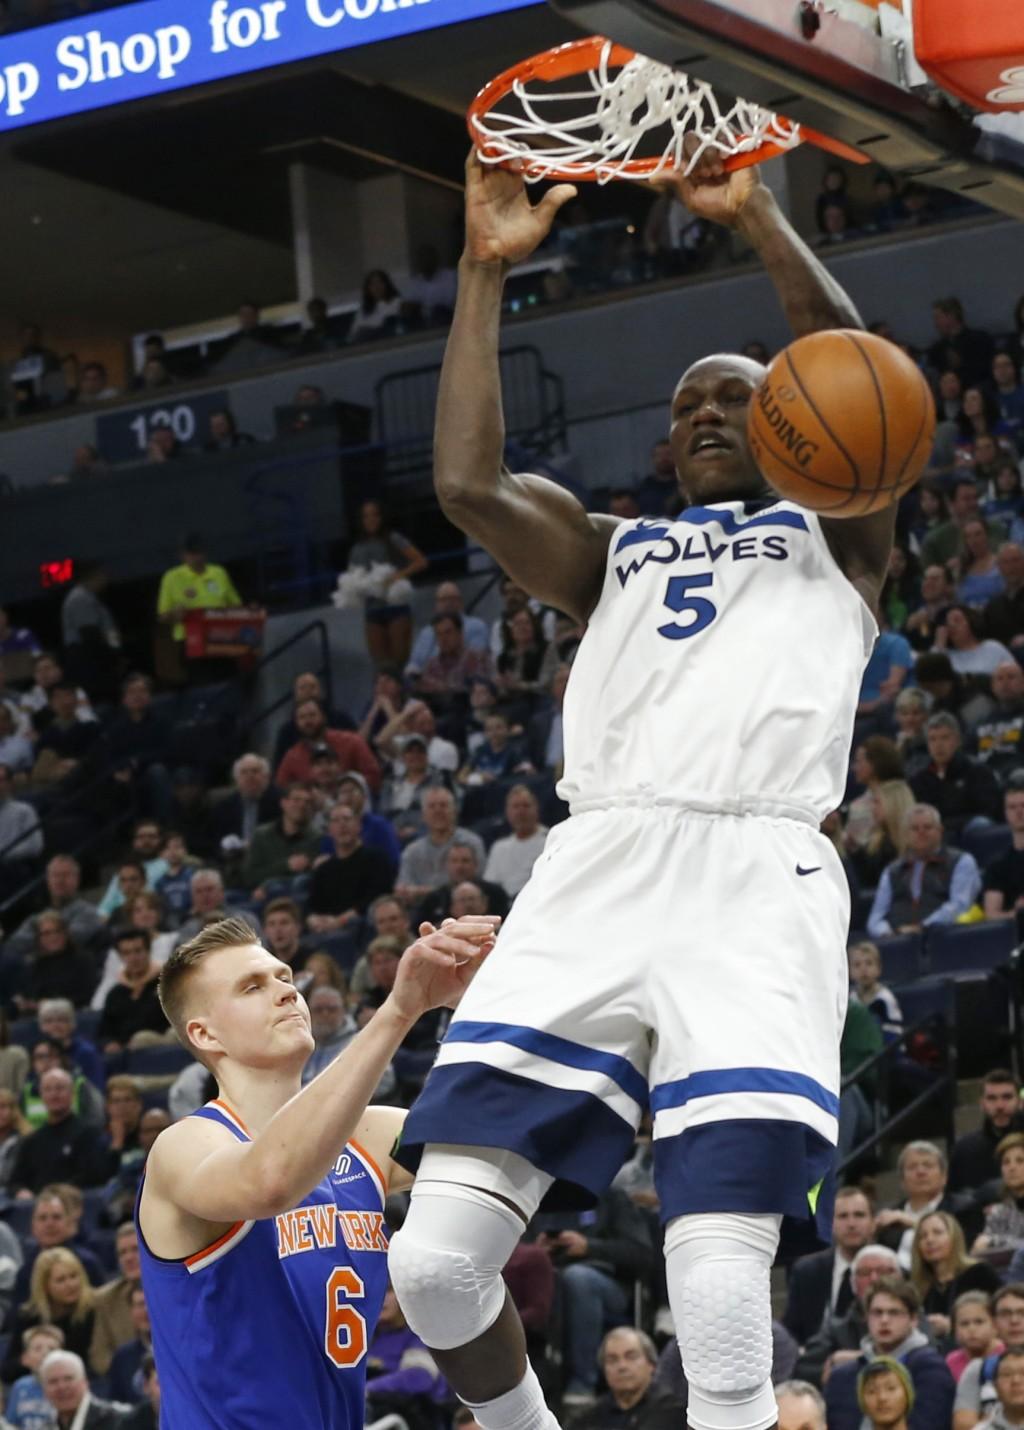 Minnesota Timberwolves' Gorgui Dieng, right, of Senegal, dunks as New York Knicks' Kristaps Porzingis, of Latvia, looks on in the first half of an NBA